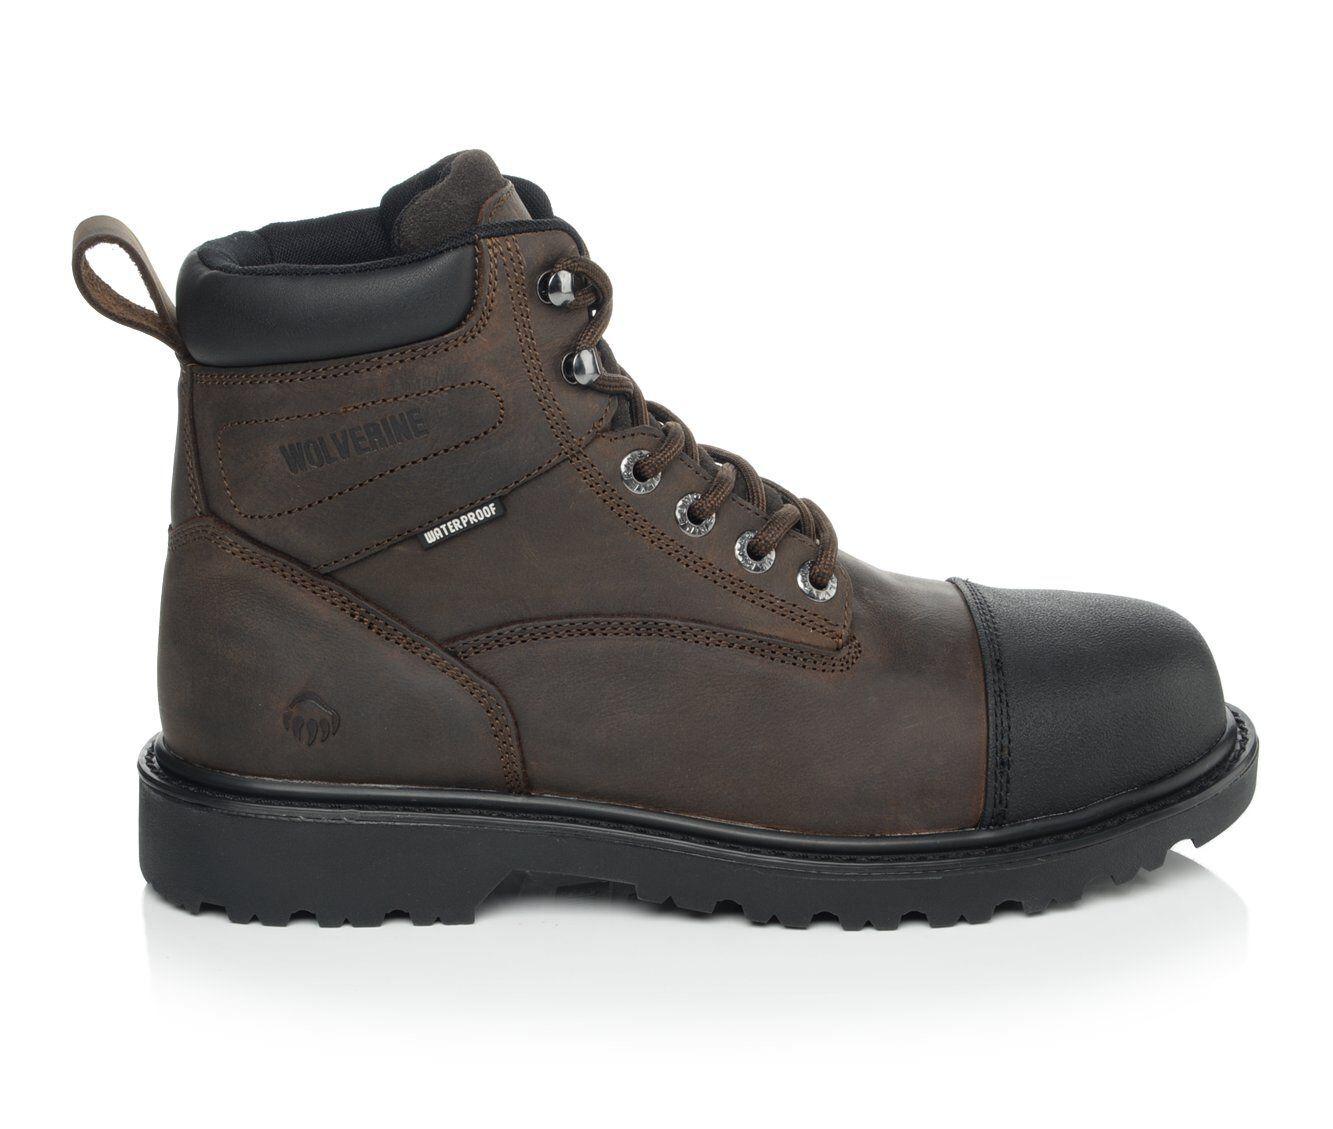 uk shoes_kd1246